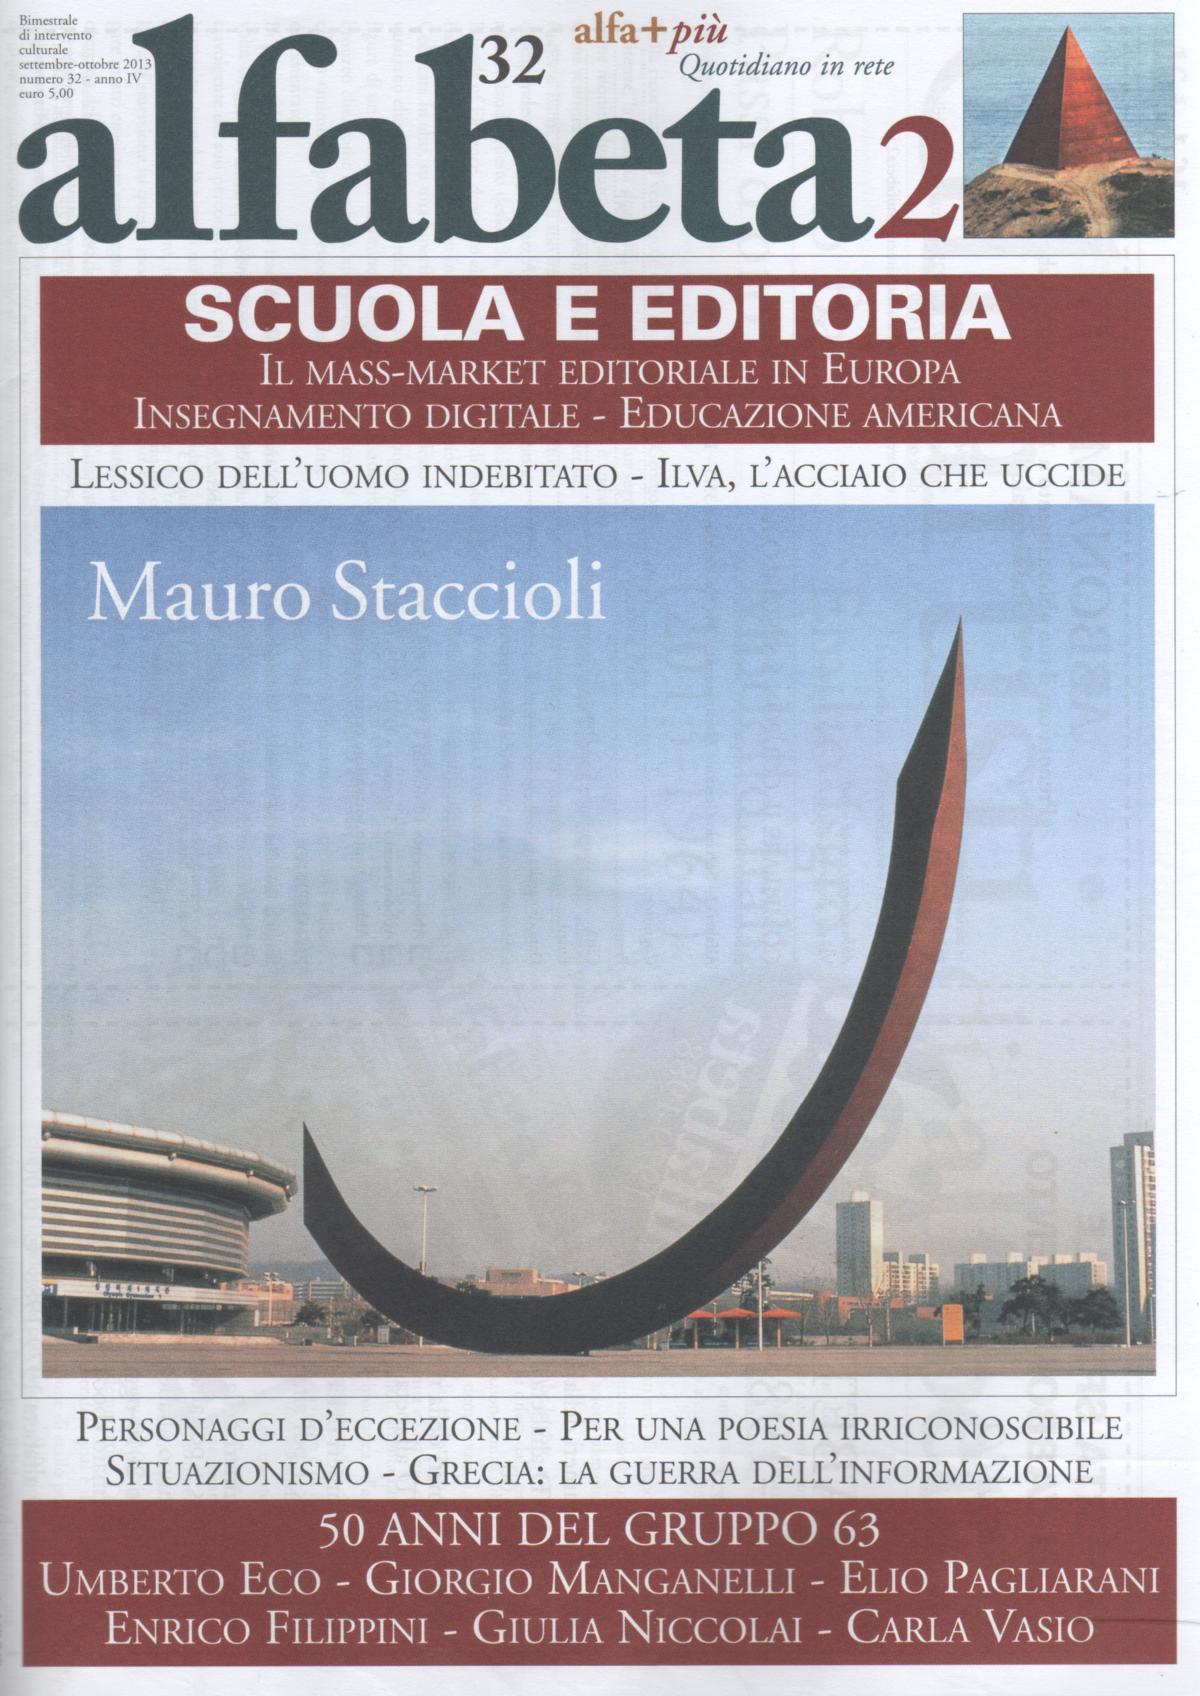 Alfabeta2, Anno IV, n.32 (settembre-ottobre 2013)